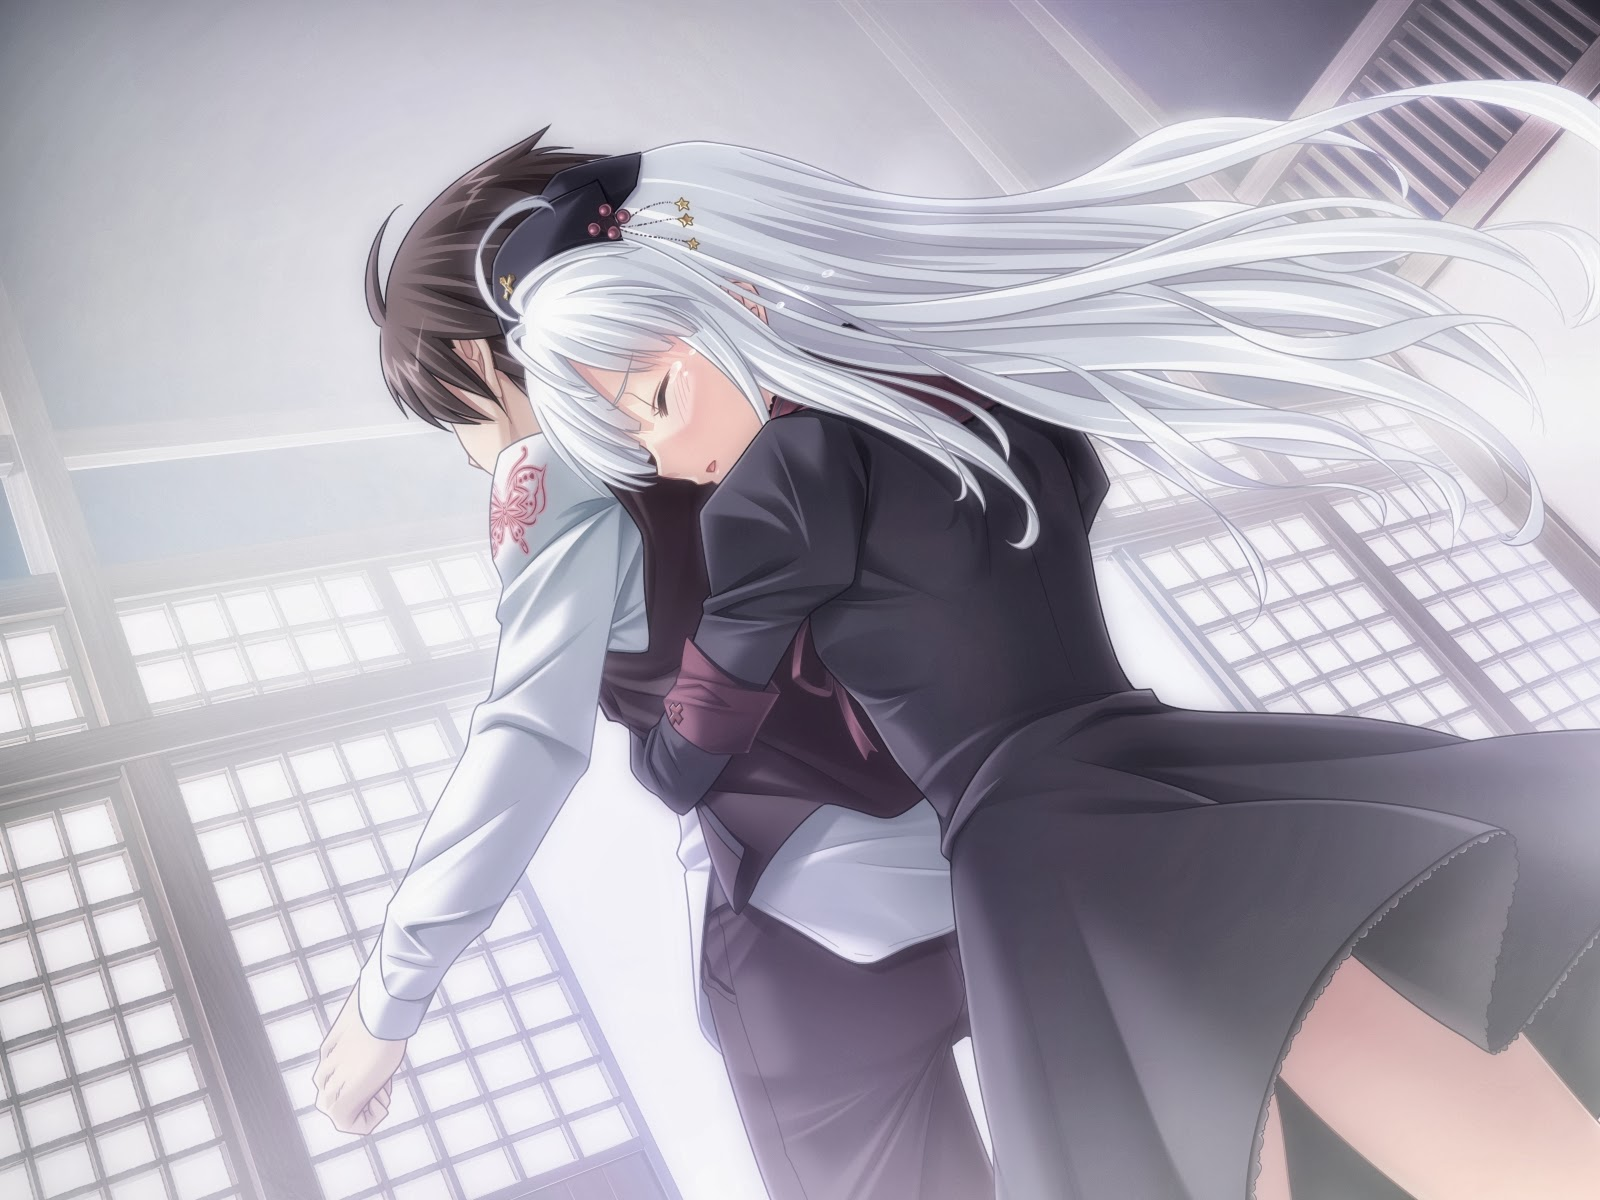 Love is the most powerful light - Anime hug pics ...